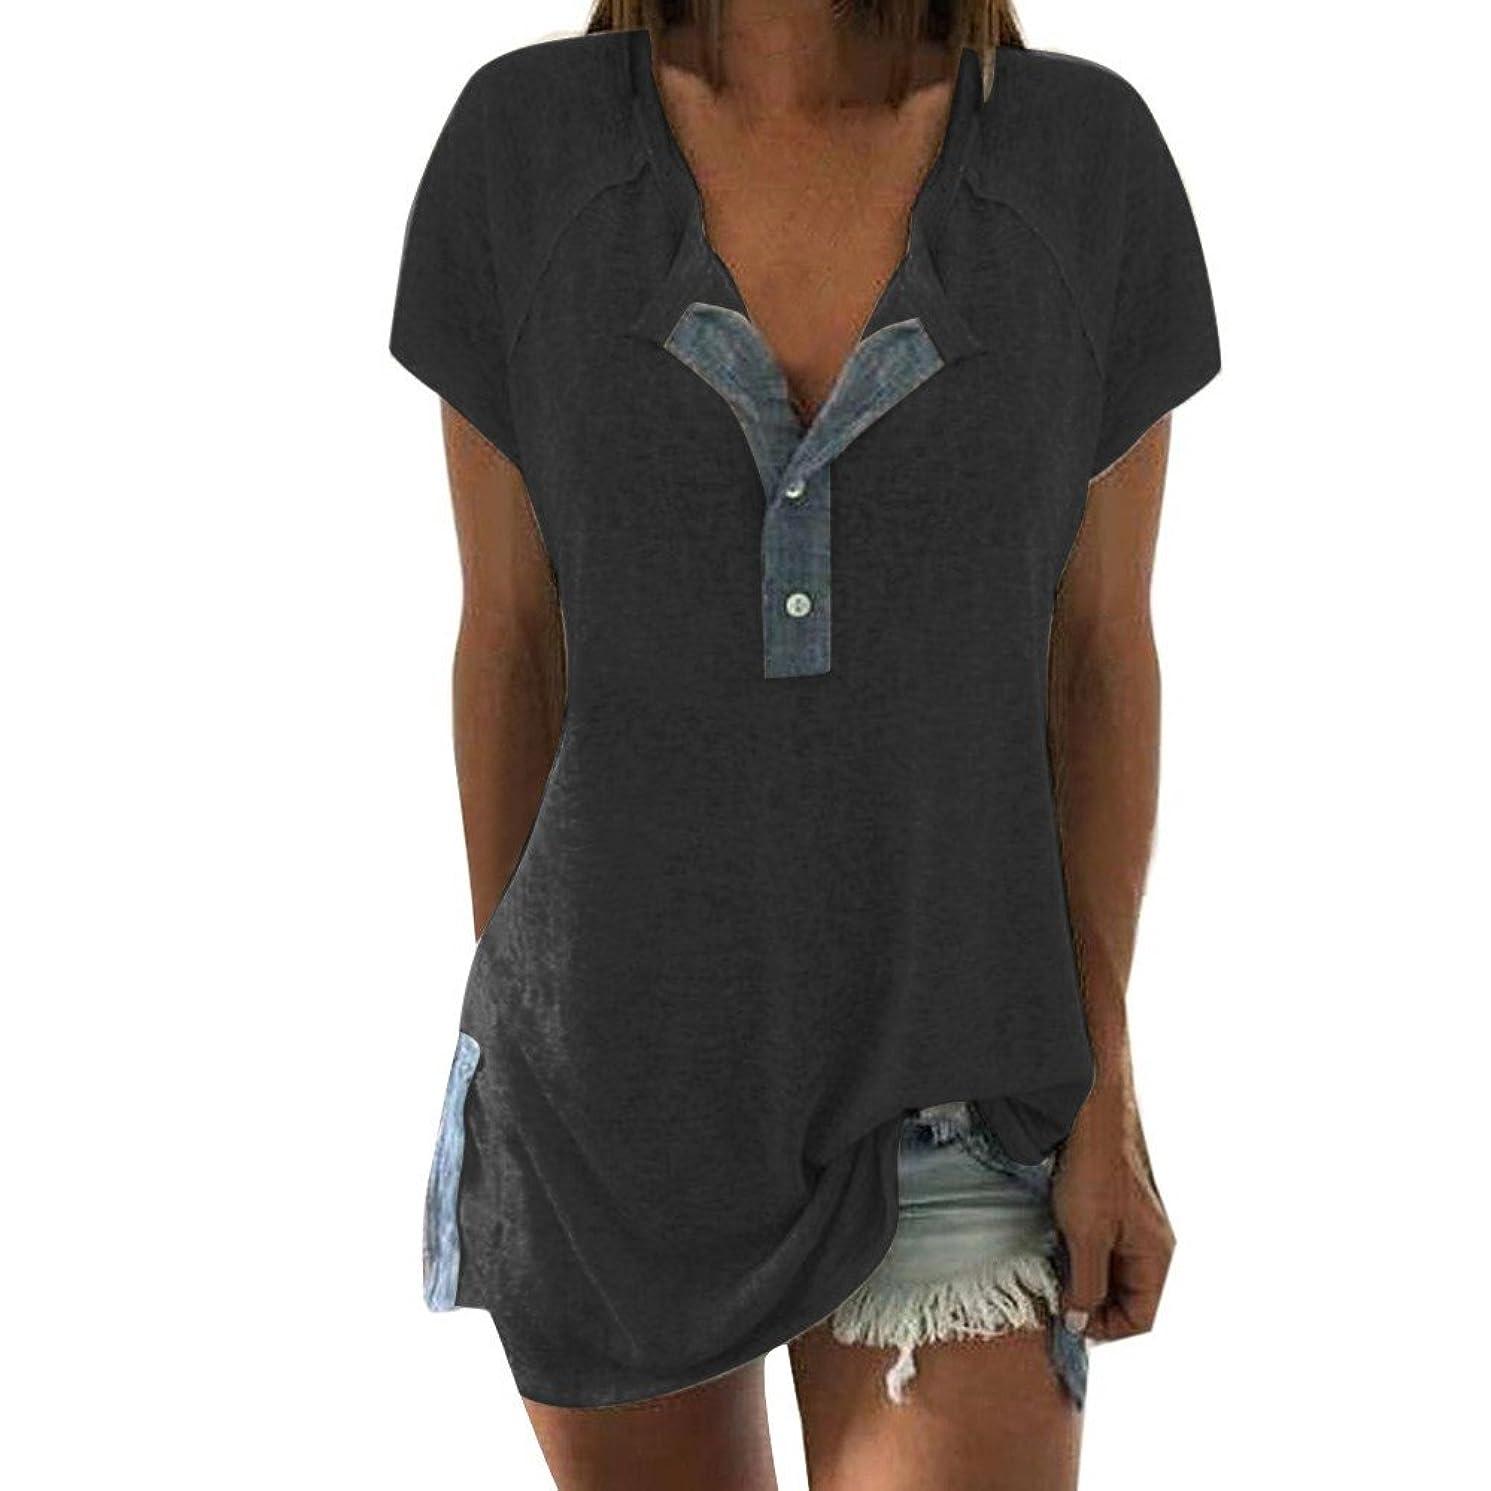 AOJIAN T Shirt Women Short Sleeve Shirts Blouse Tanks Vest Tops